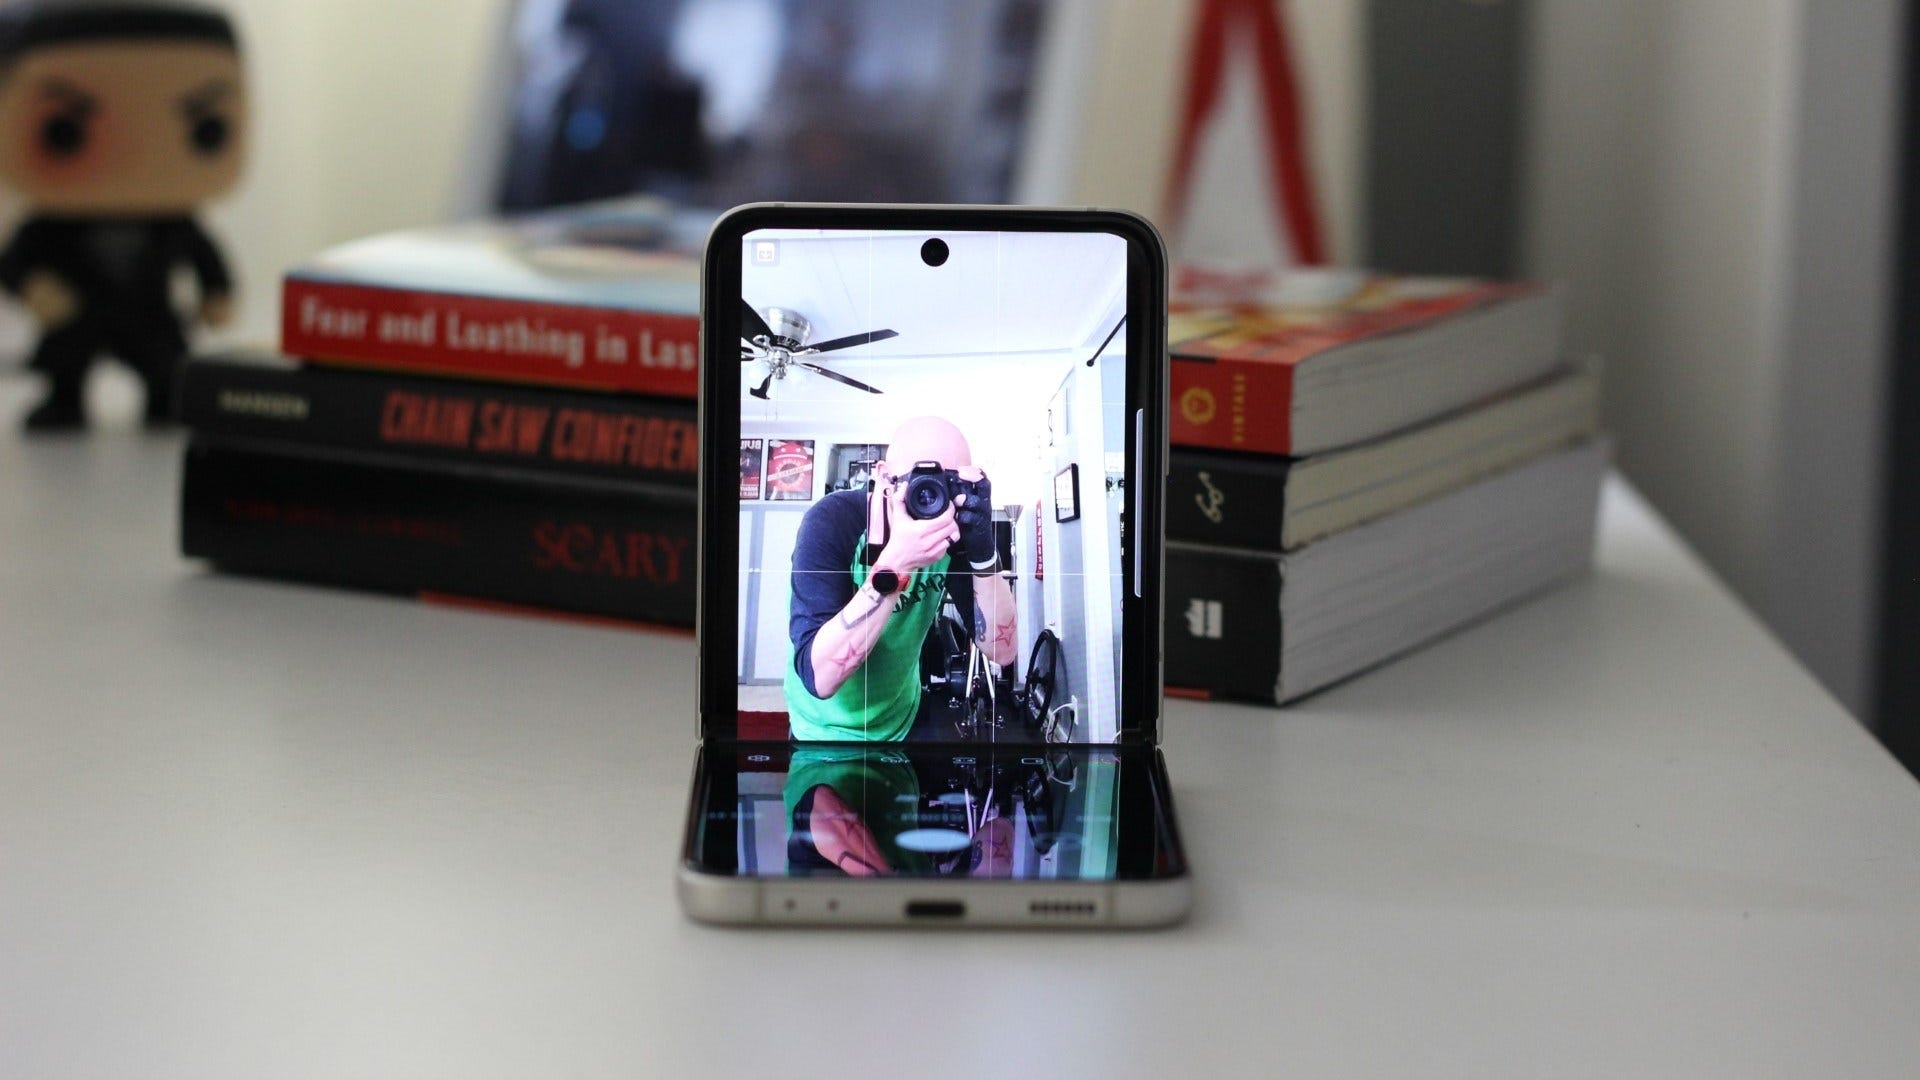 The Flip 3 open in flex mode, front camera active